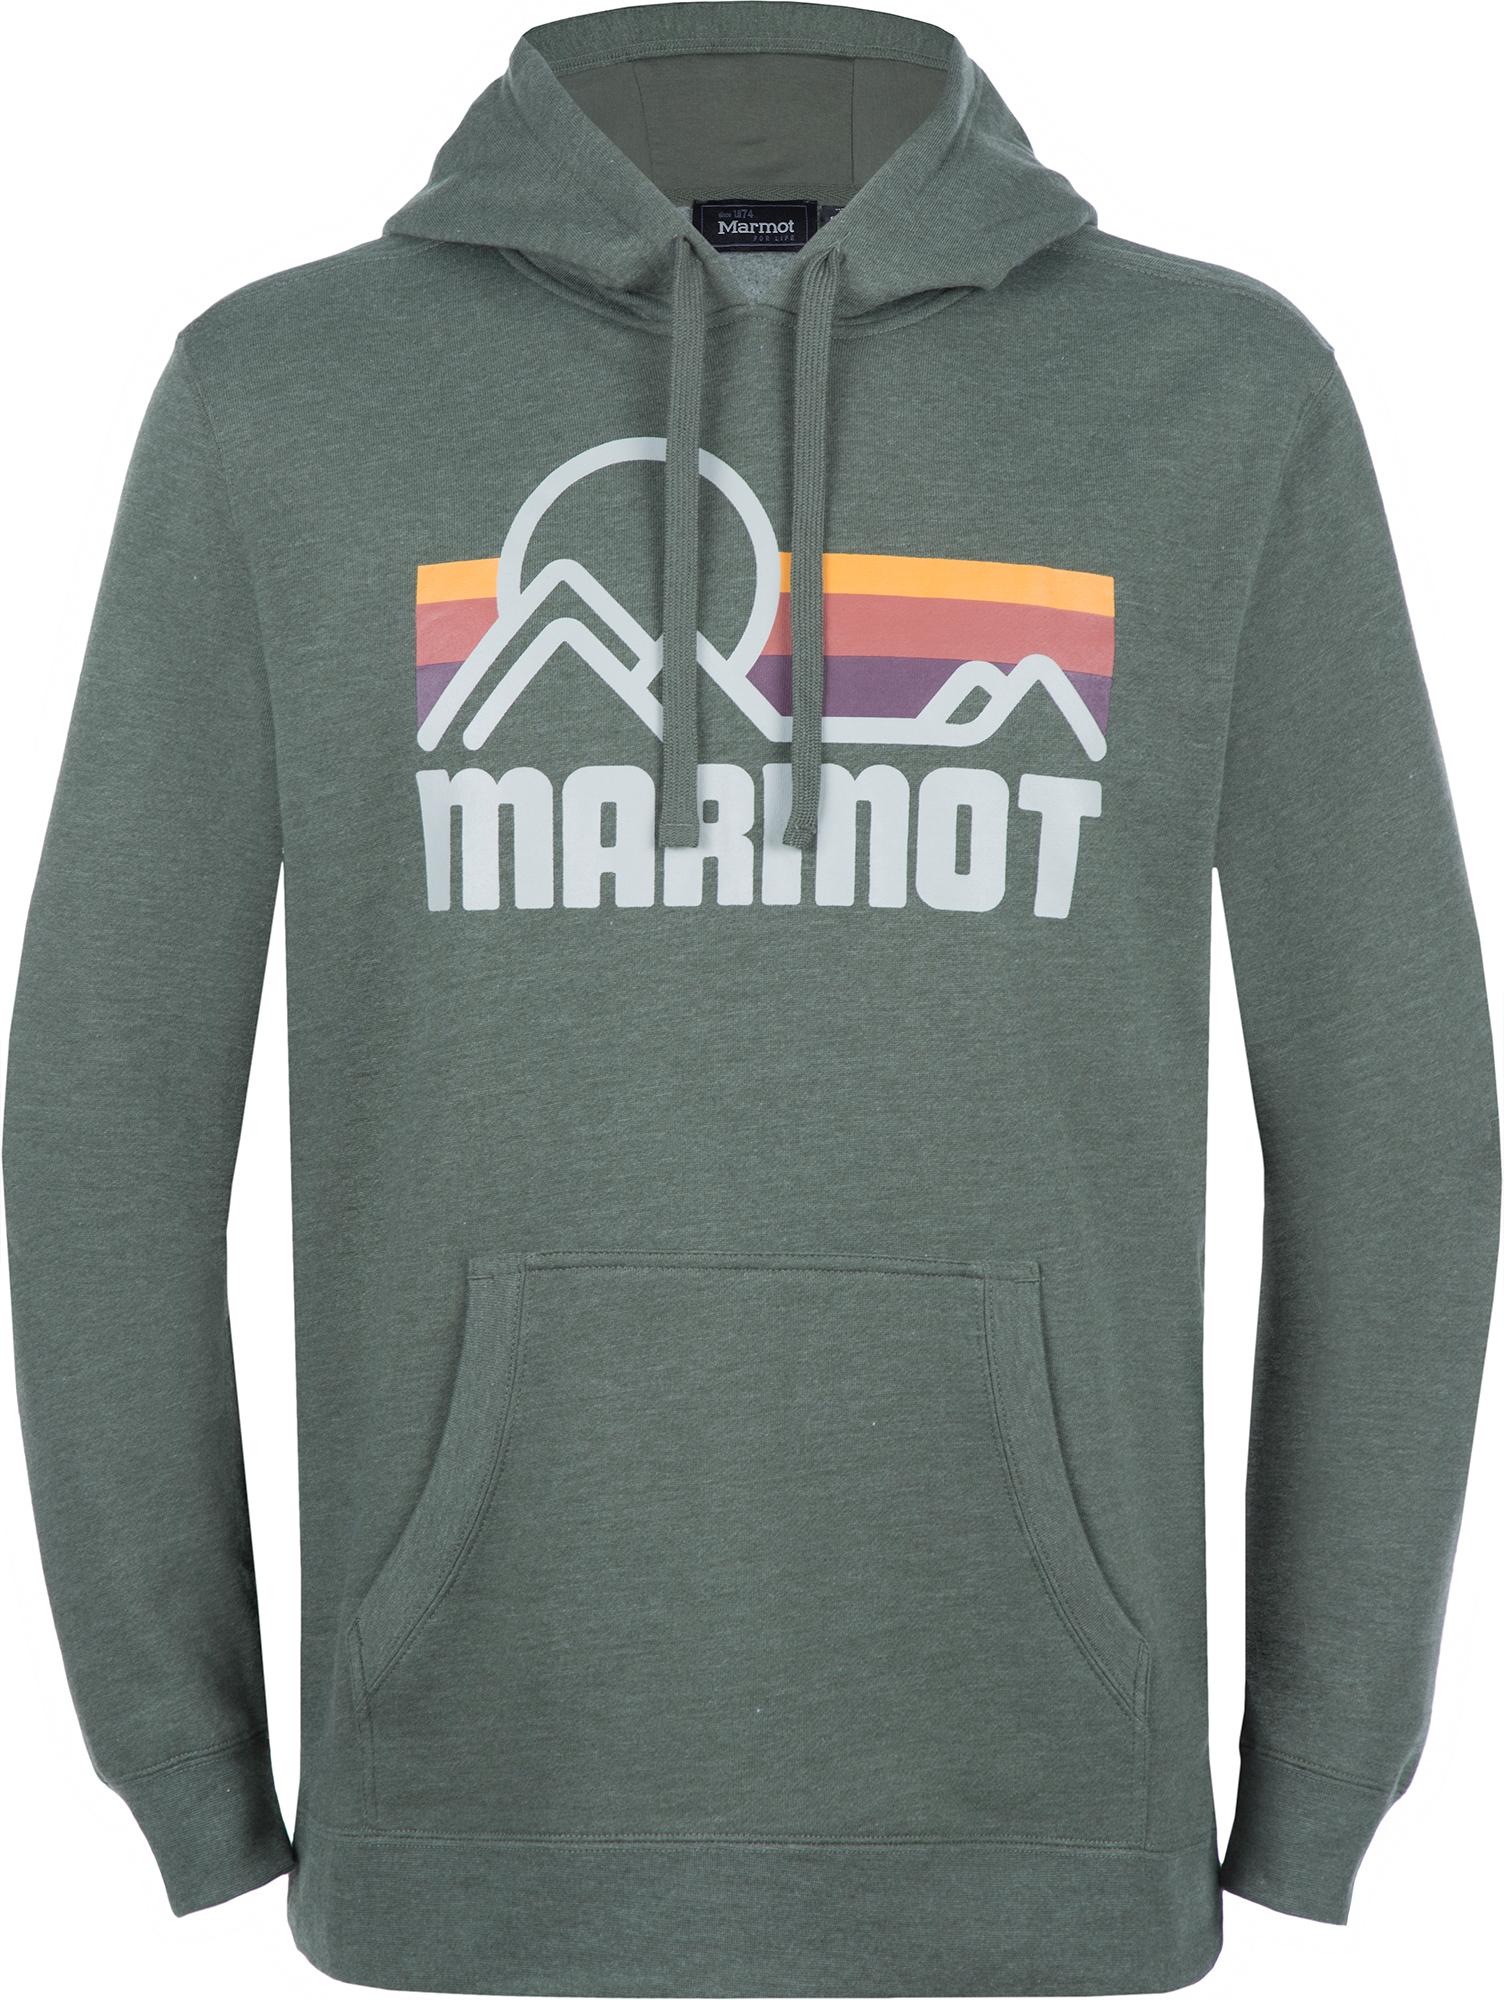 Marmot Худи мужская Marmot Coastal, размер 54-56 худи superdry оранжевый 54 размер